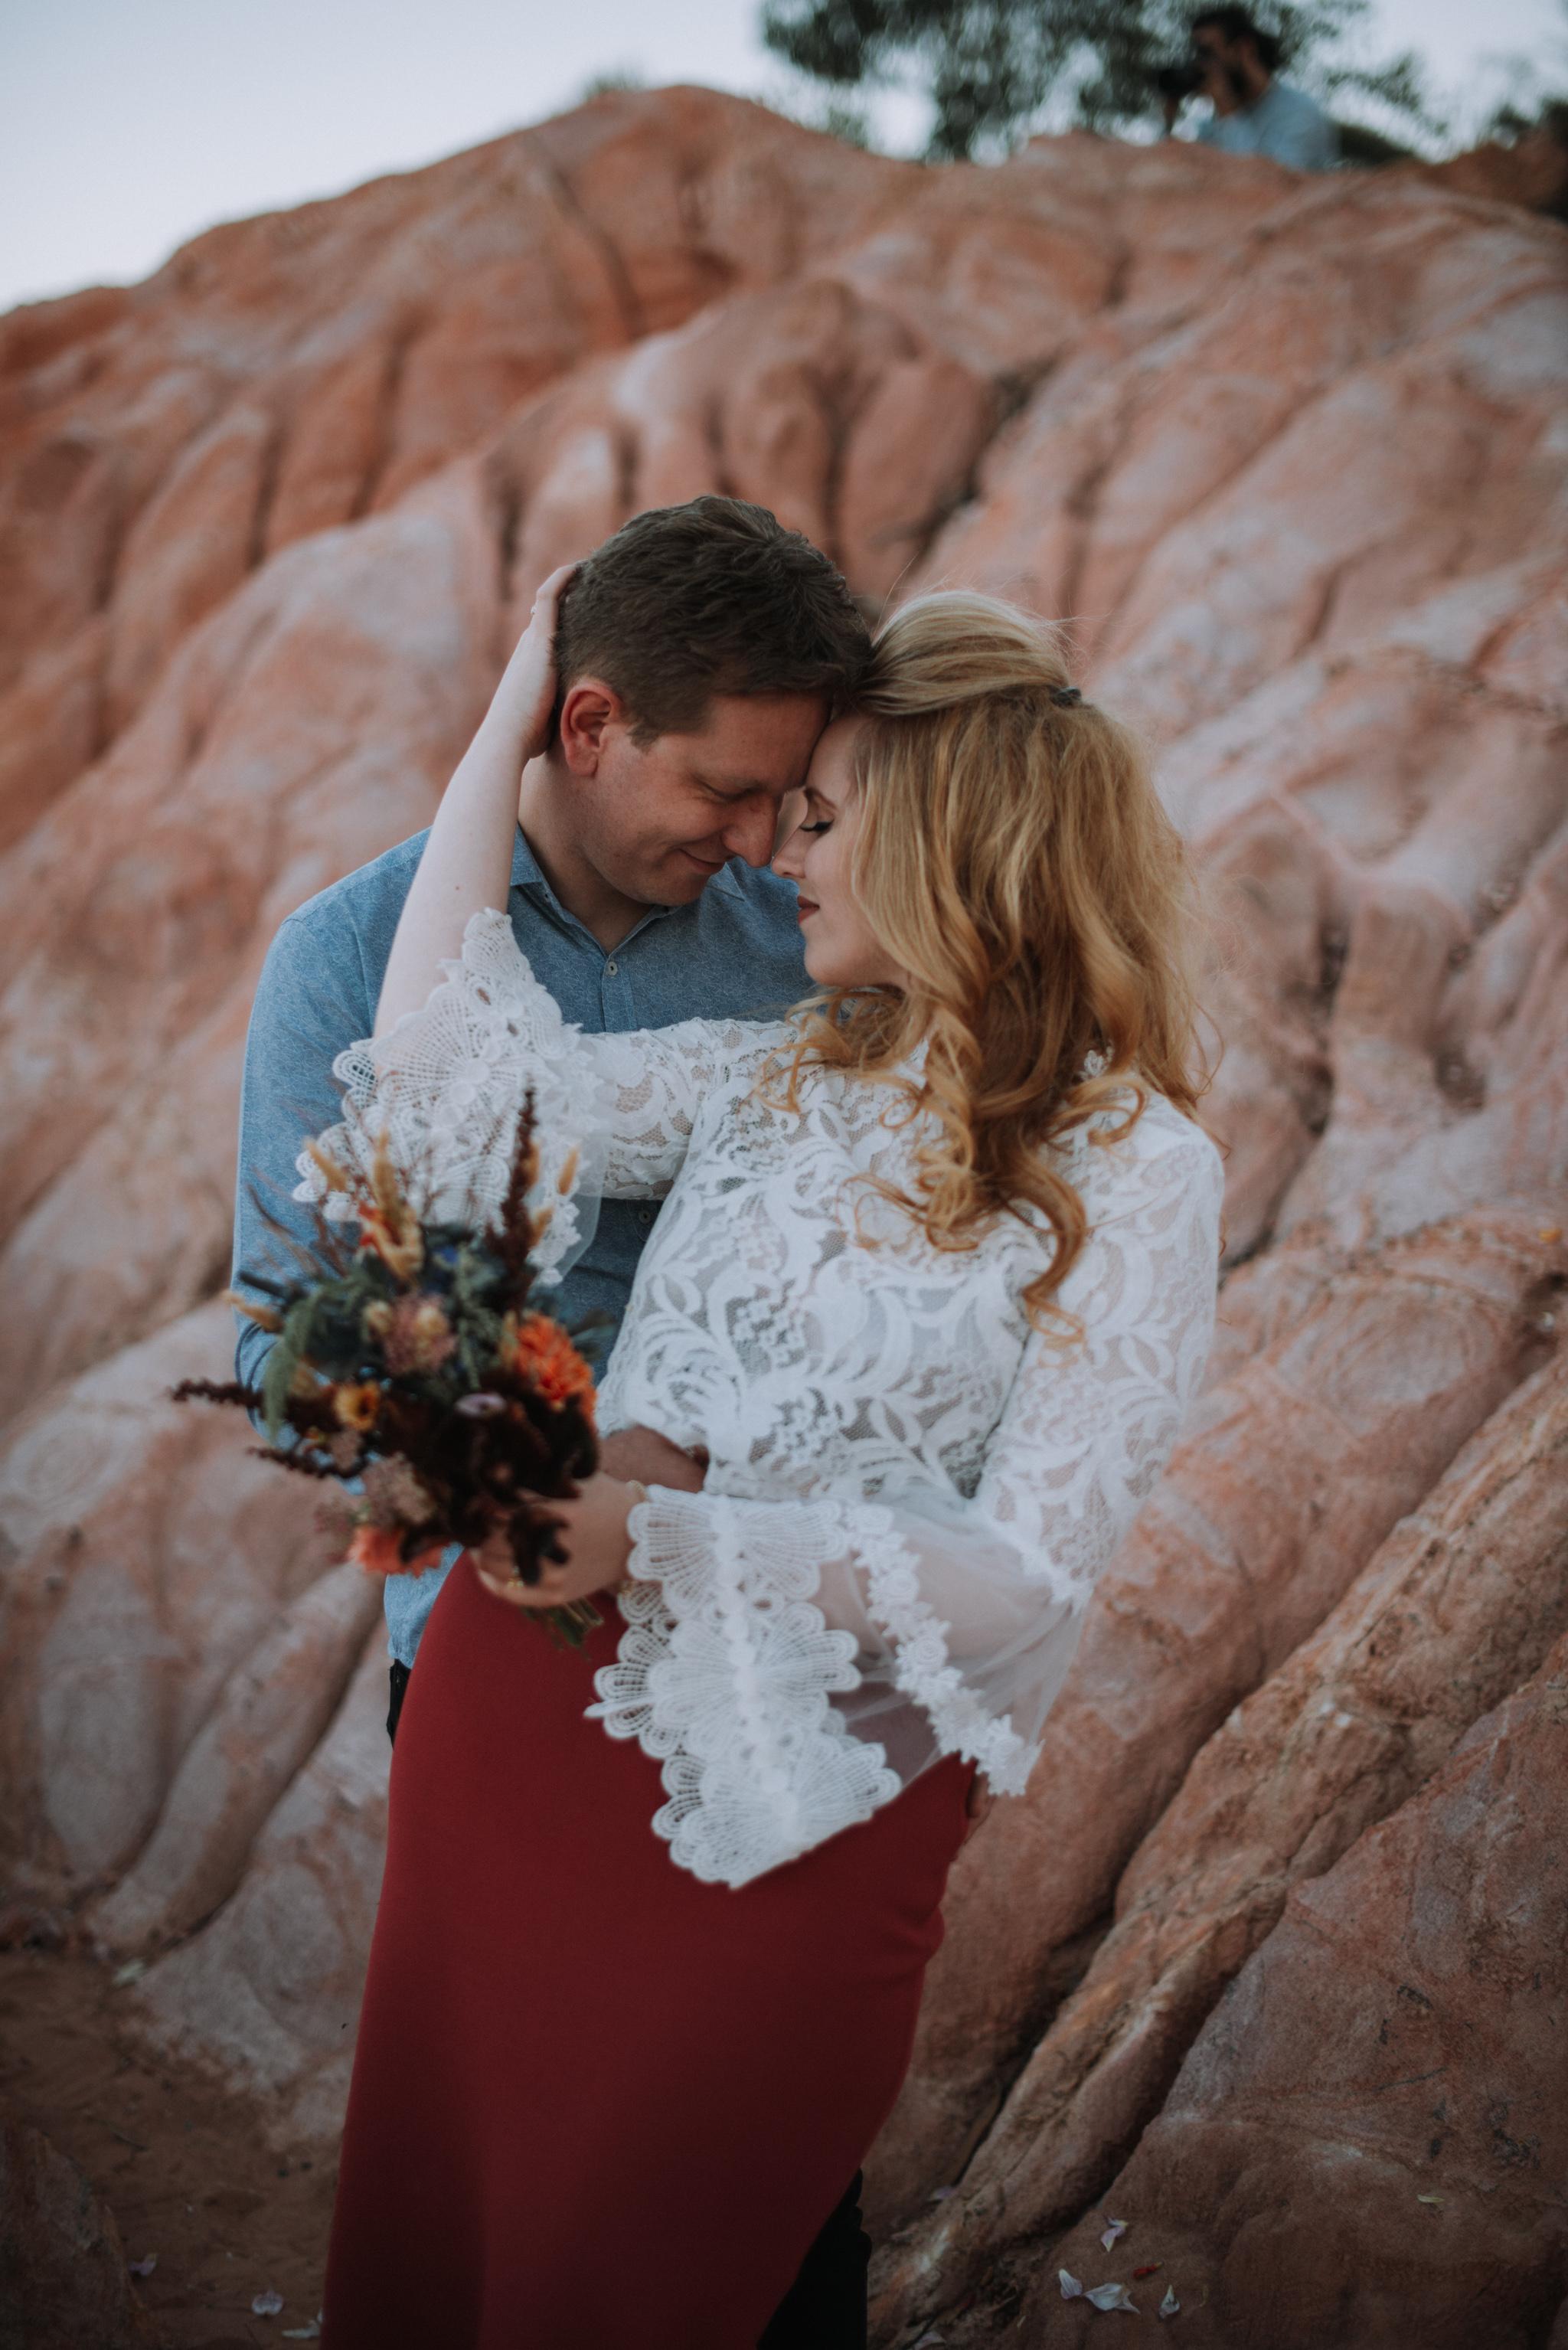 LOVELENSCAPES PHOTOGRAPHY • VISUAL POETRY • MELBOURNE WEDDING PHOTOGRAPHER • ALANNAH HILL DRESS • SUNSET ENGAGEMENT PHOTOS • PINK CLIFFS HEATHCOTE • FASHION EDITORIAL PHOTOGRAPHER • 13.jpg